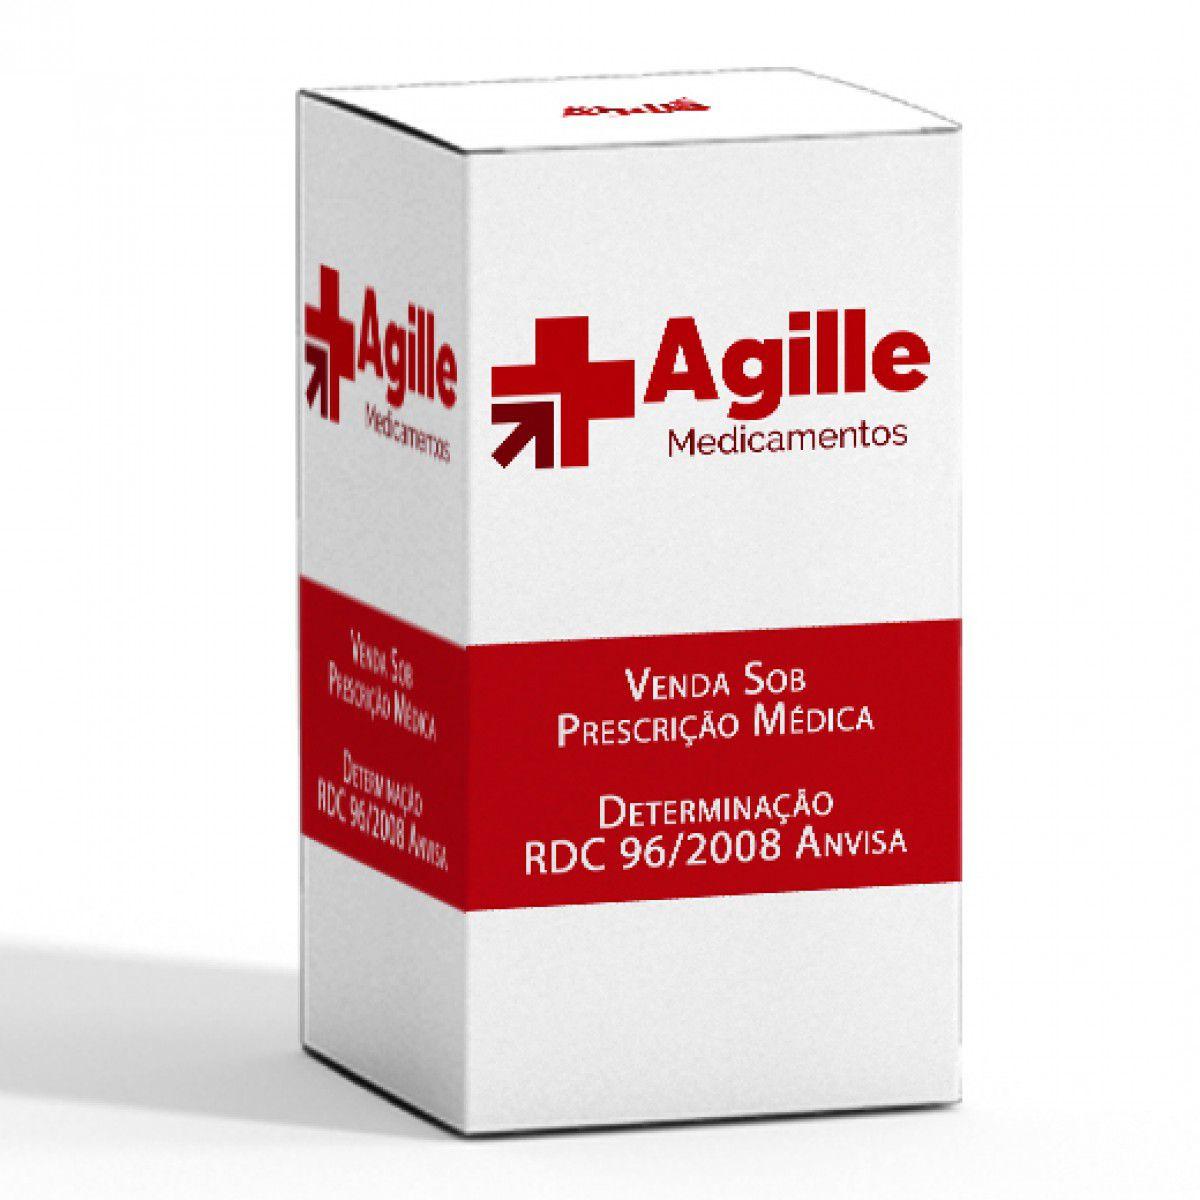 PUREGON 100UI SOL INJ CX 1 FA X 0,5ML  - Agille Speciality